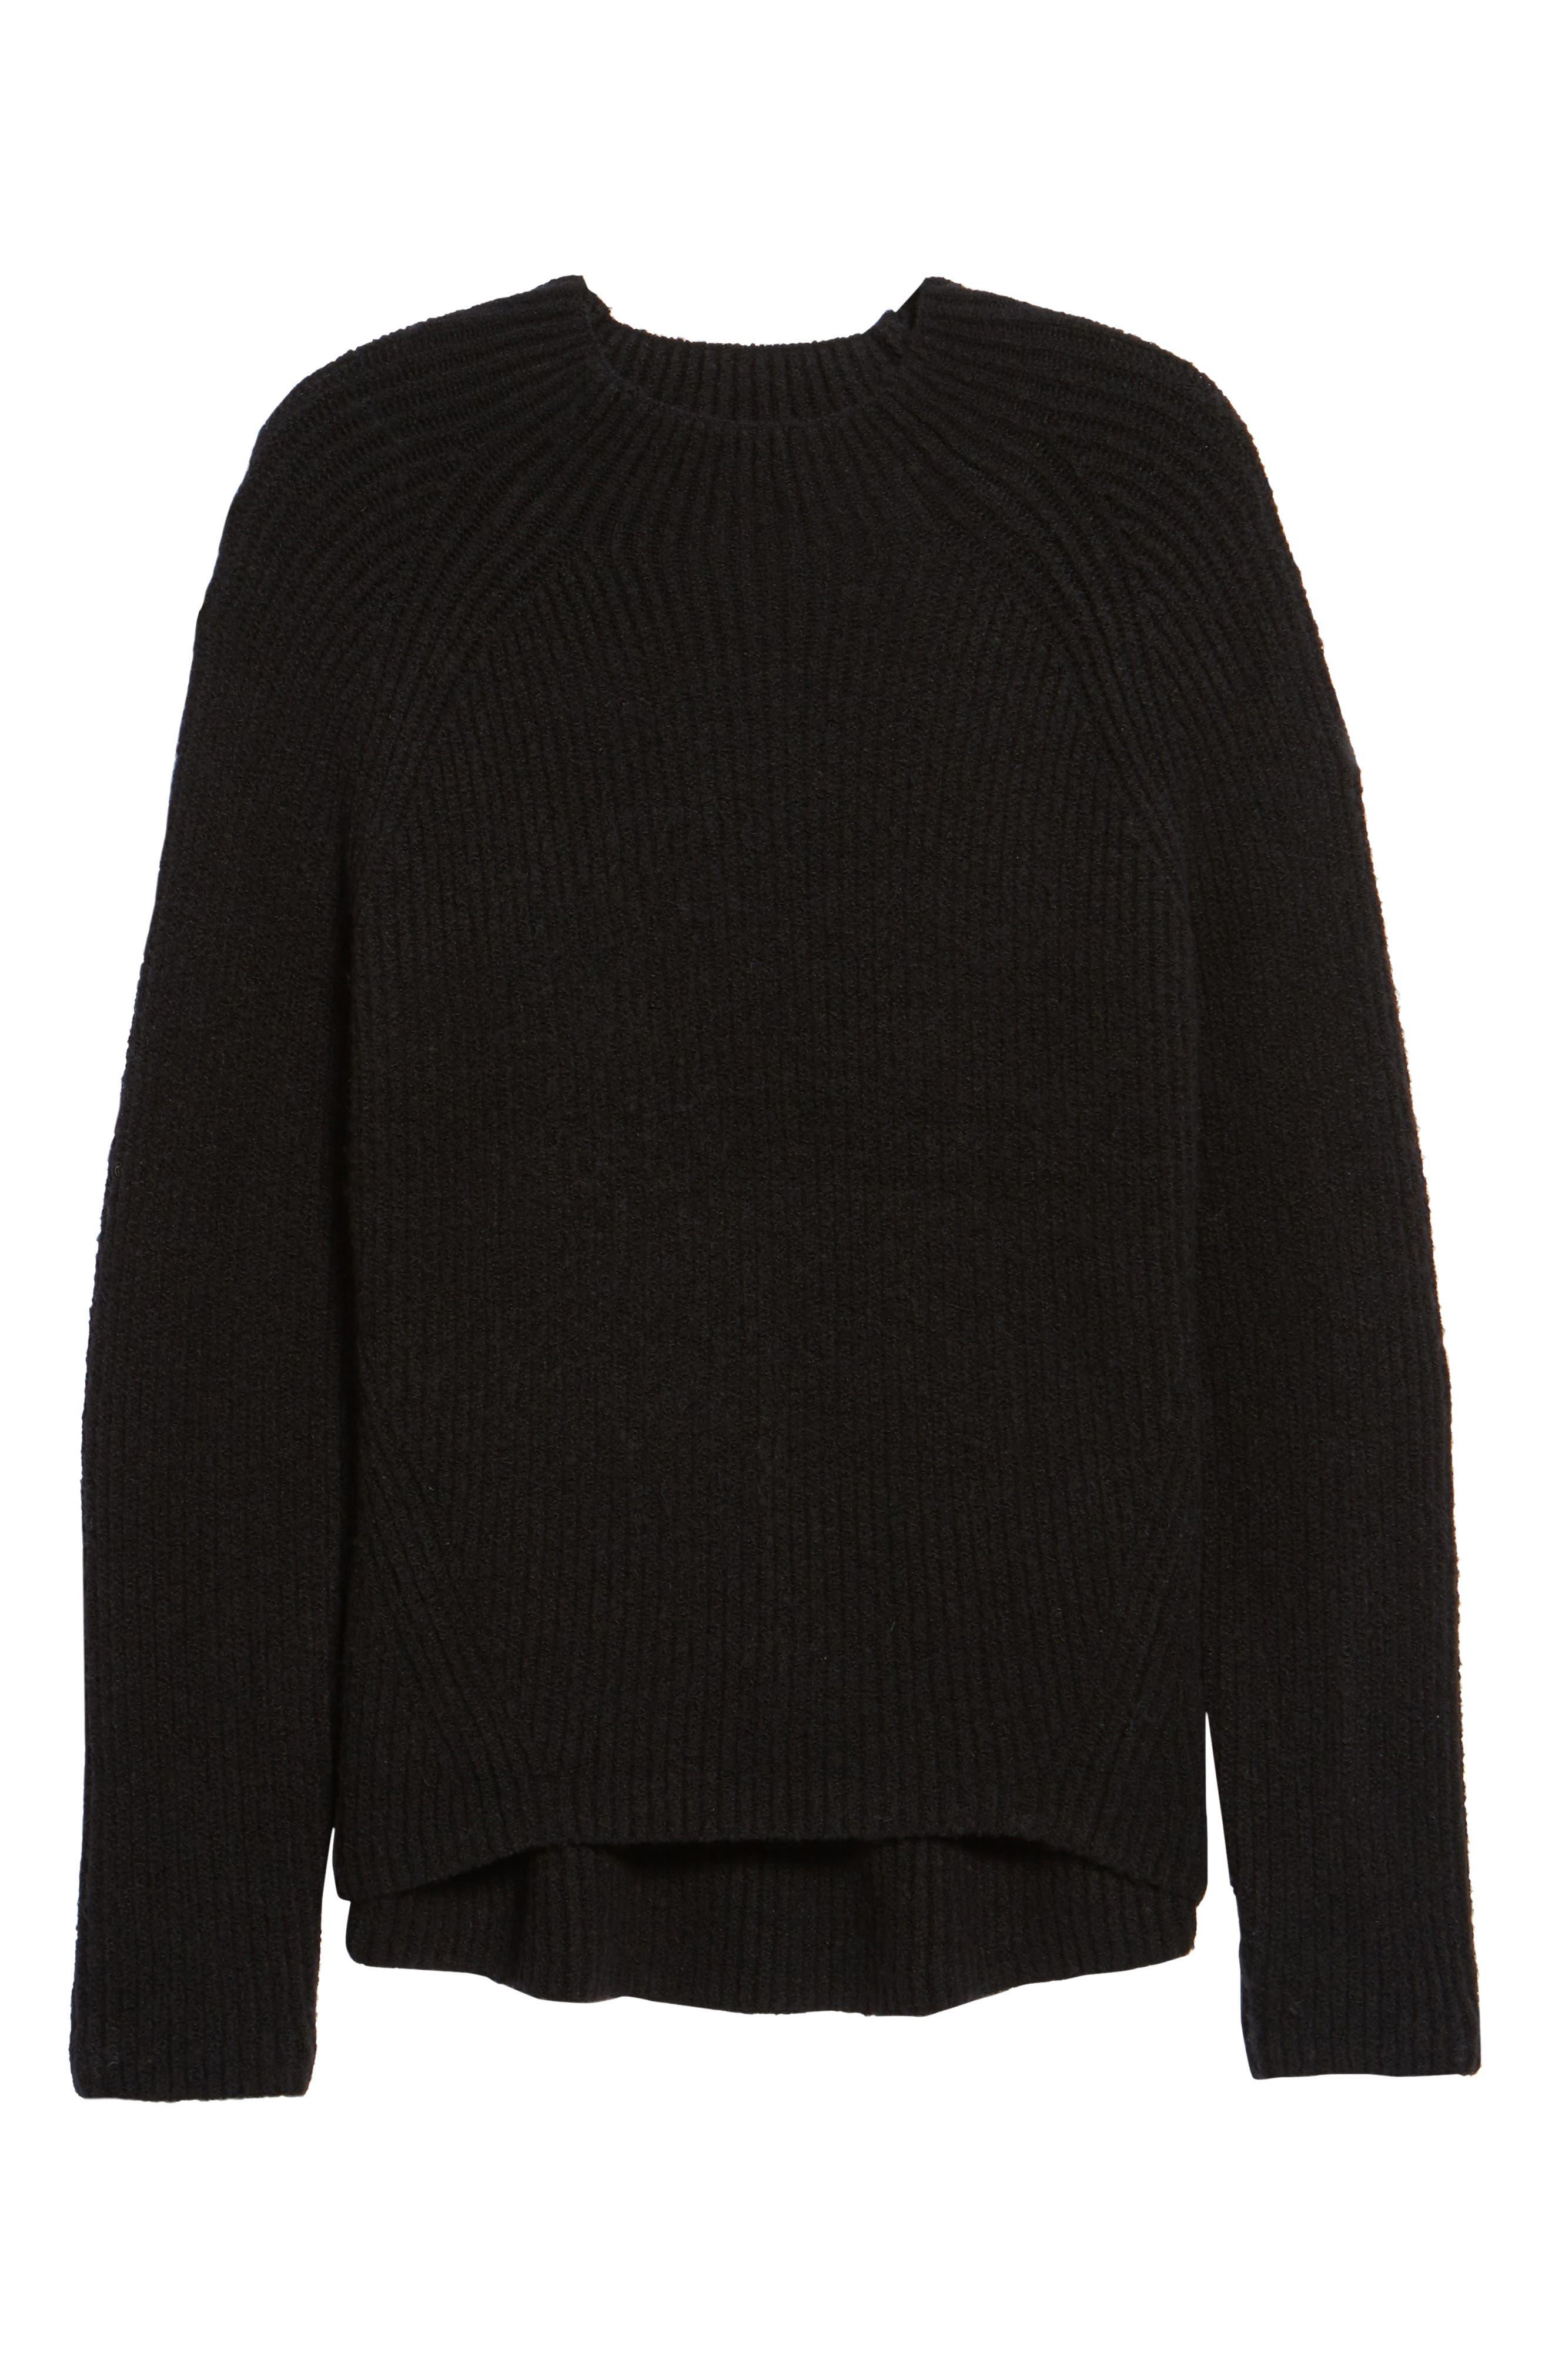 Northfield Mock Neck Sweater,                             Alternate thumbnail 6, color,                             001